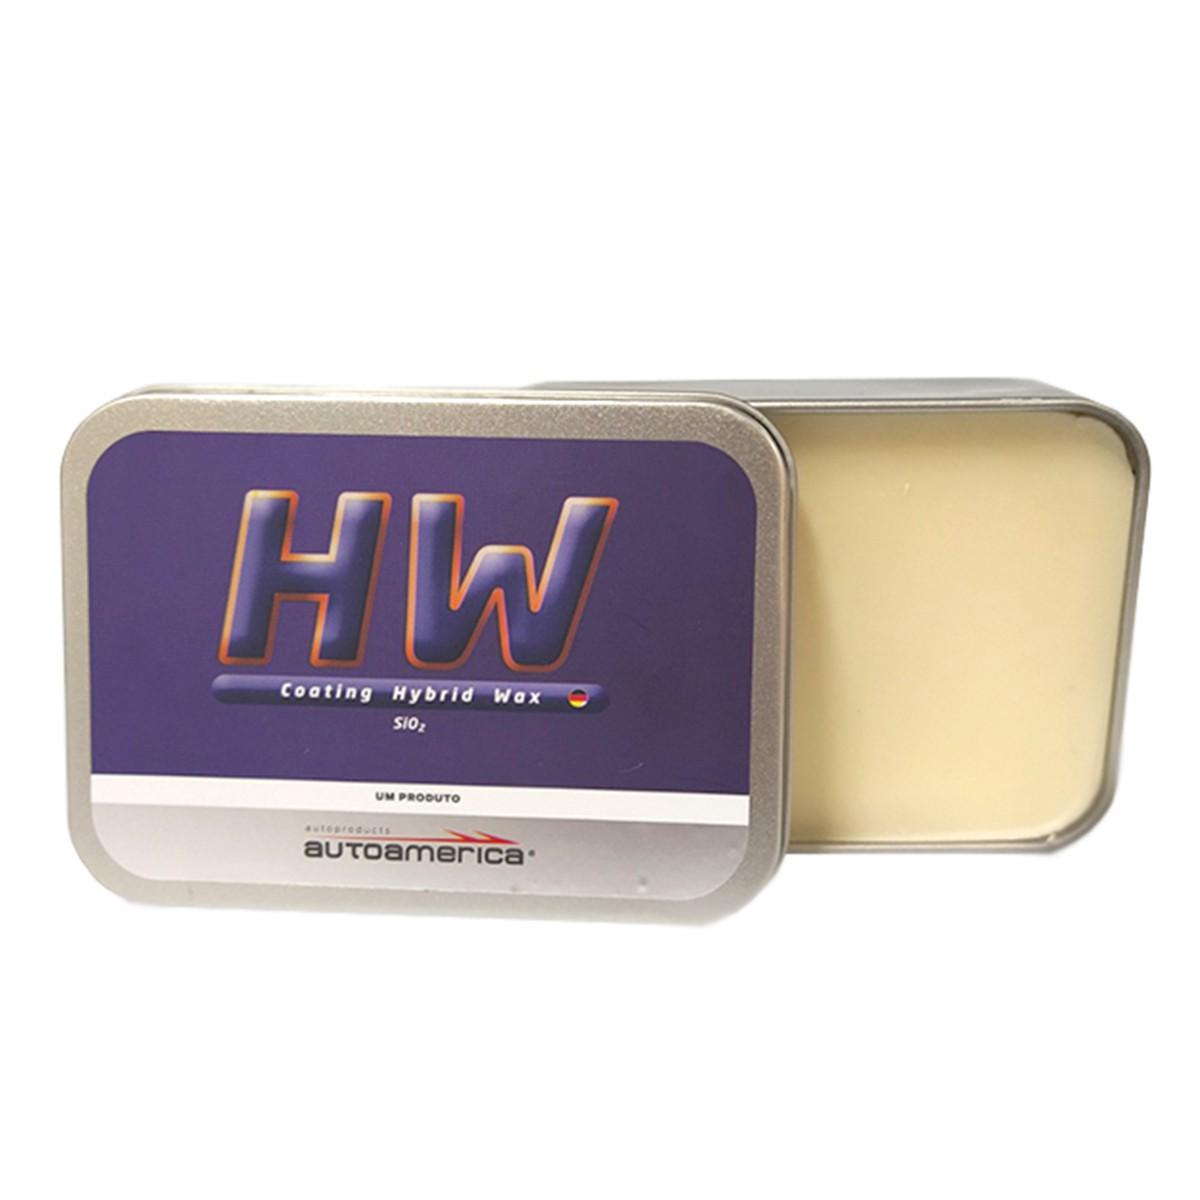 HW Coating Hybrid Wax 120g - Sio2 - Autoamerica